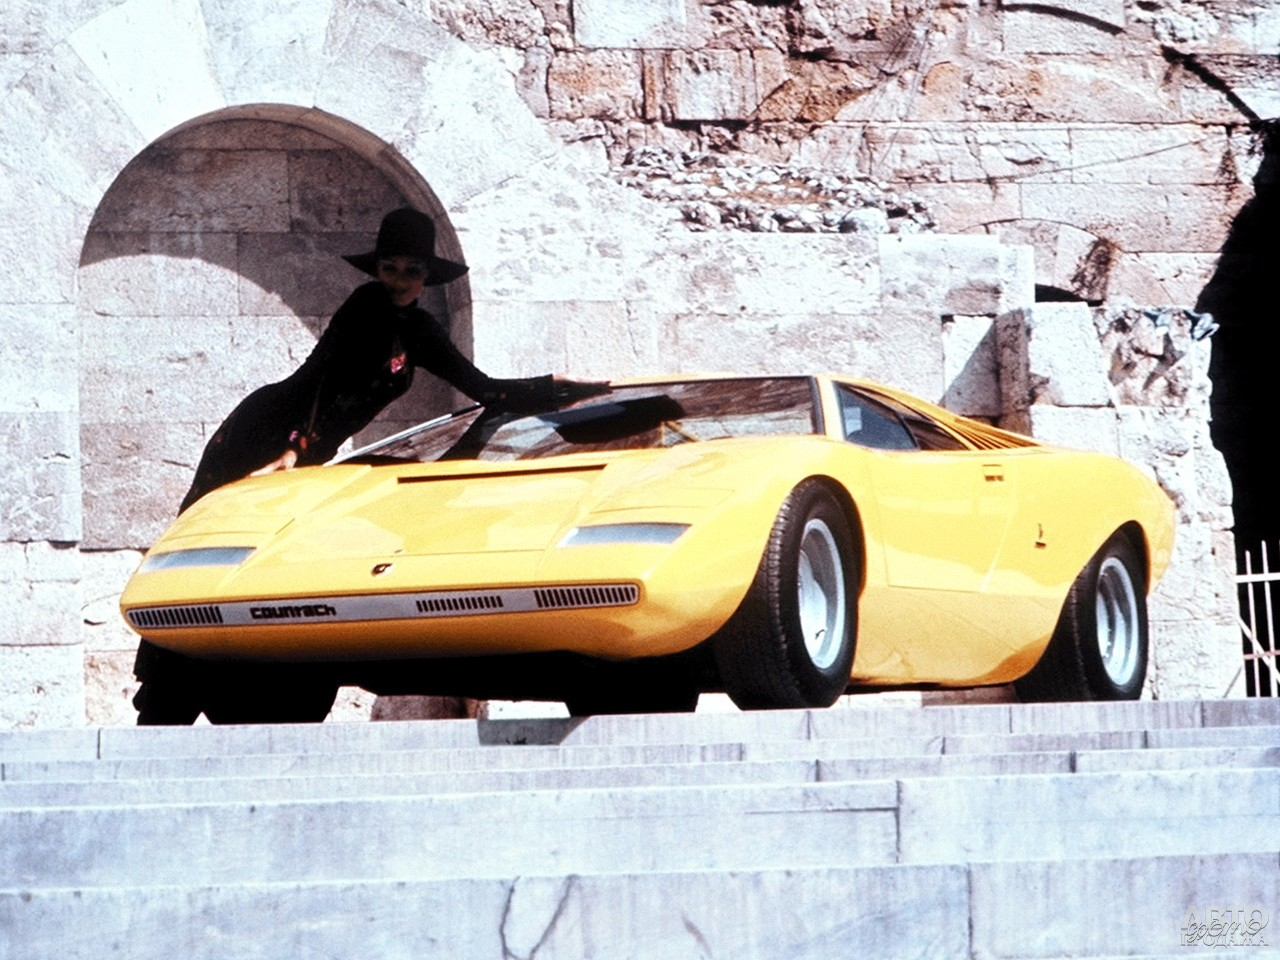 Прототип Lamborghini Countach, 1971 год